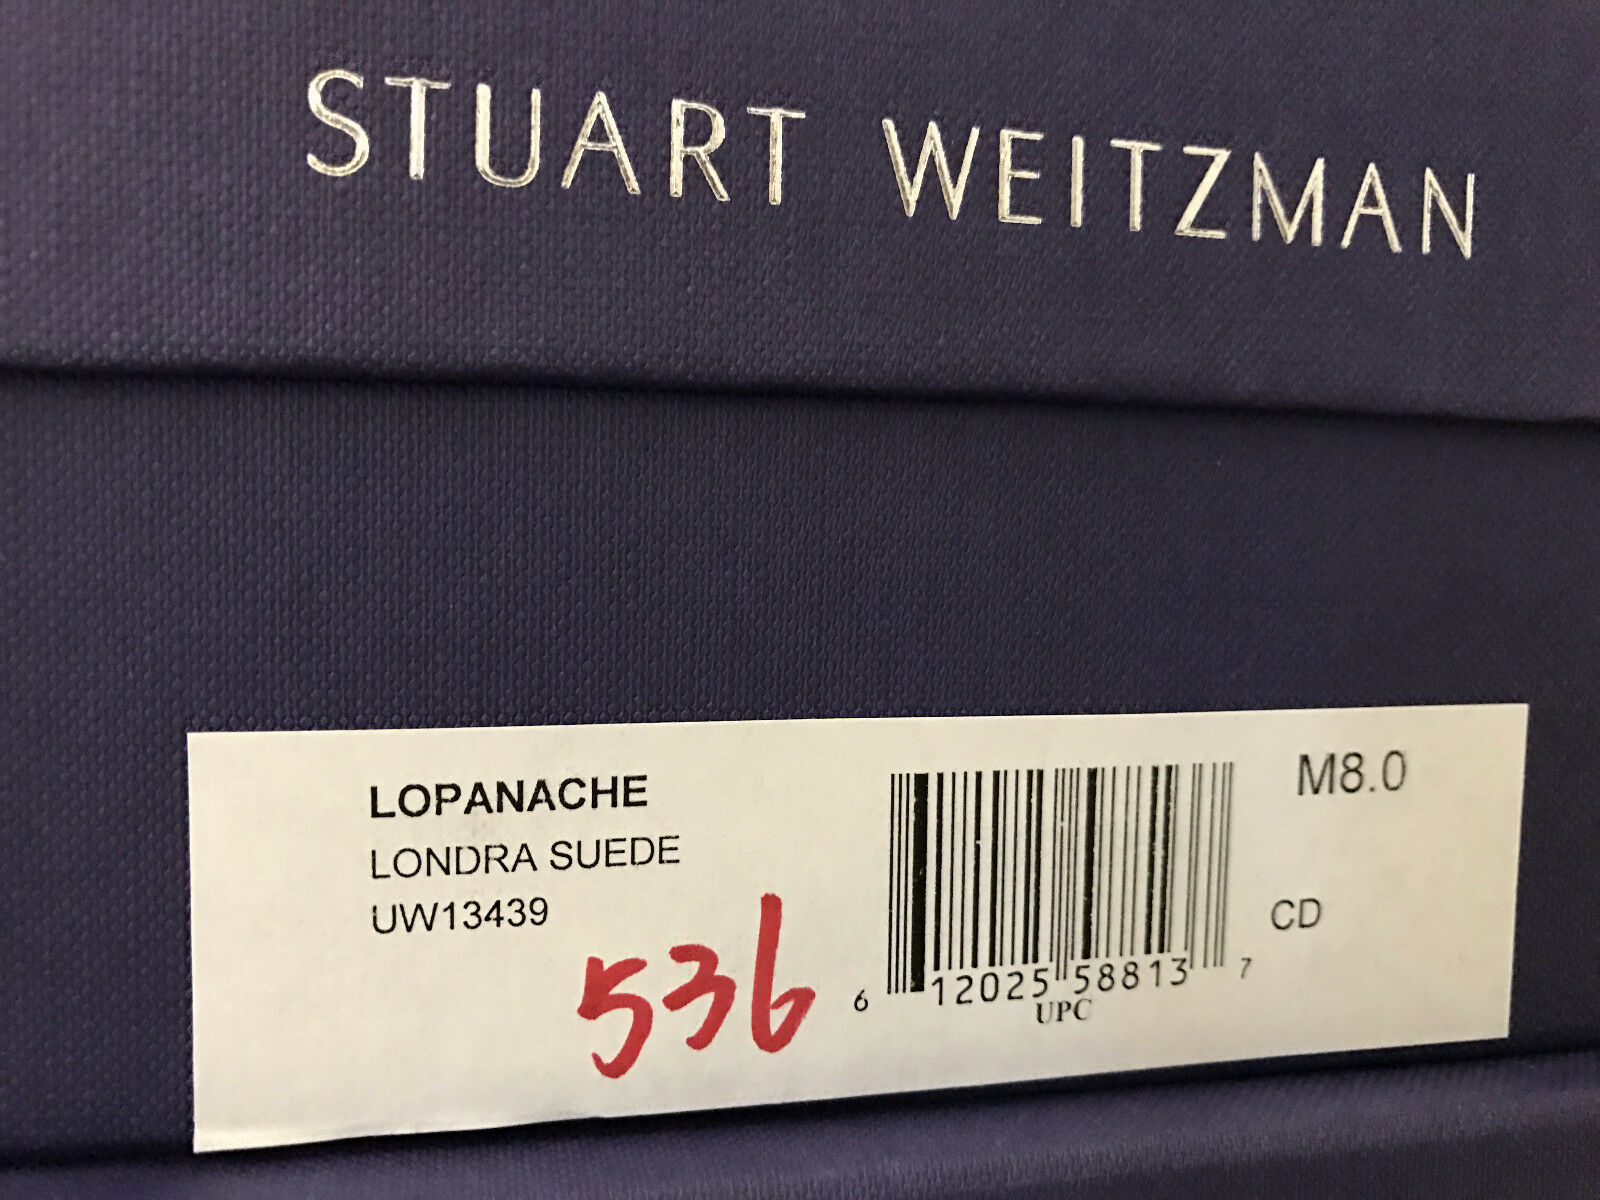 NIB Stuart Weitzman Lopanache Dress kitten heel Pump Pump Pump Londra SUEDE 8 8ec2b0